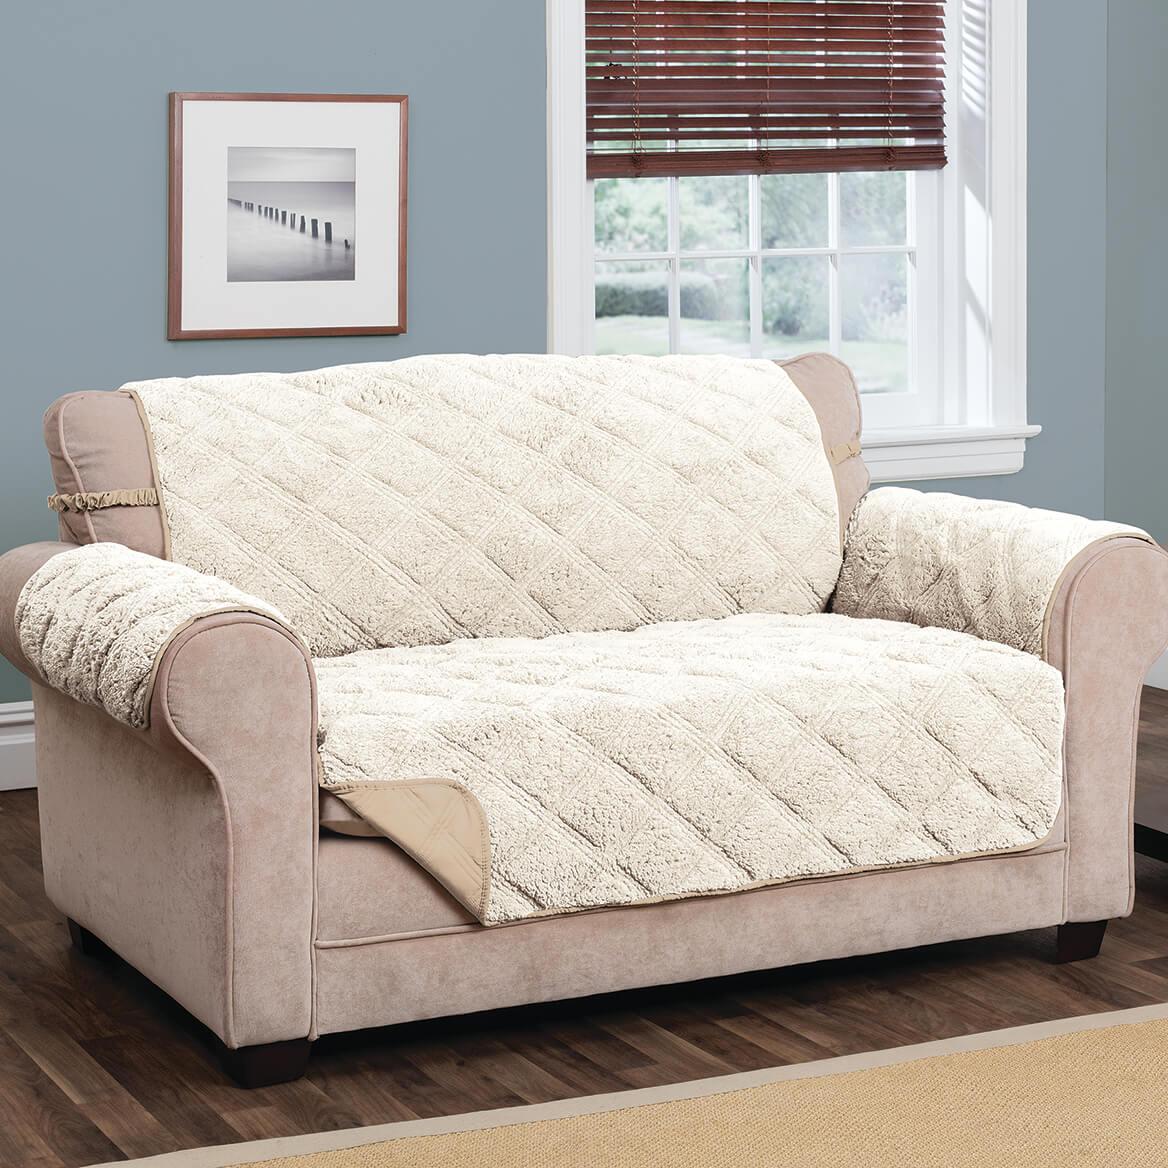 Hudson Waterproof Sherpa XL Sofa Protector by OakRidge-365405